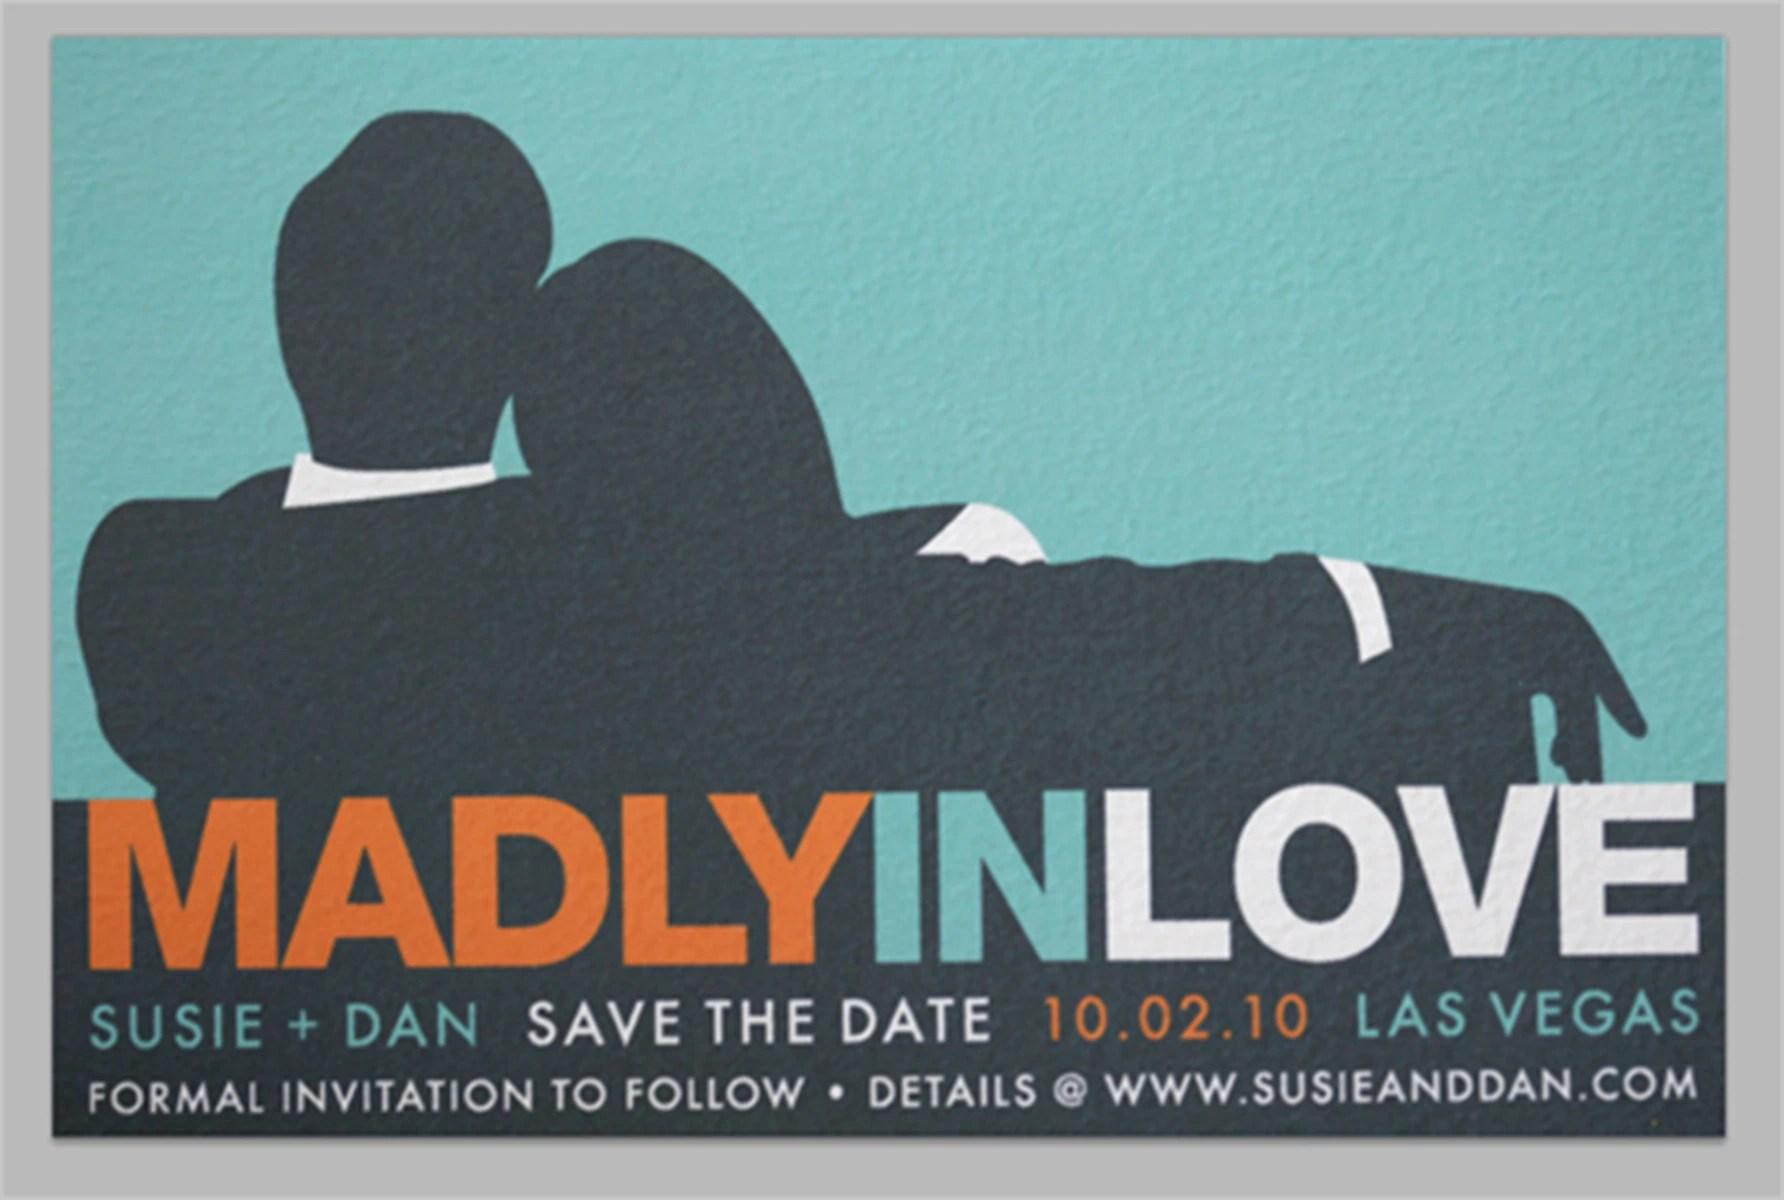 20 cool wedding invitations unique wedding invitations 20 cool wedding invitations